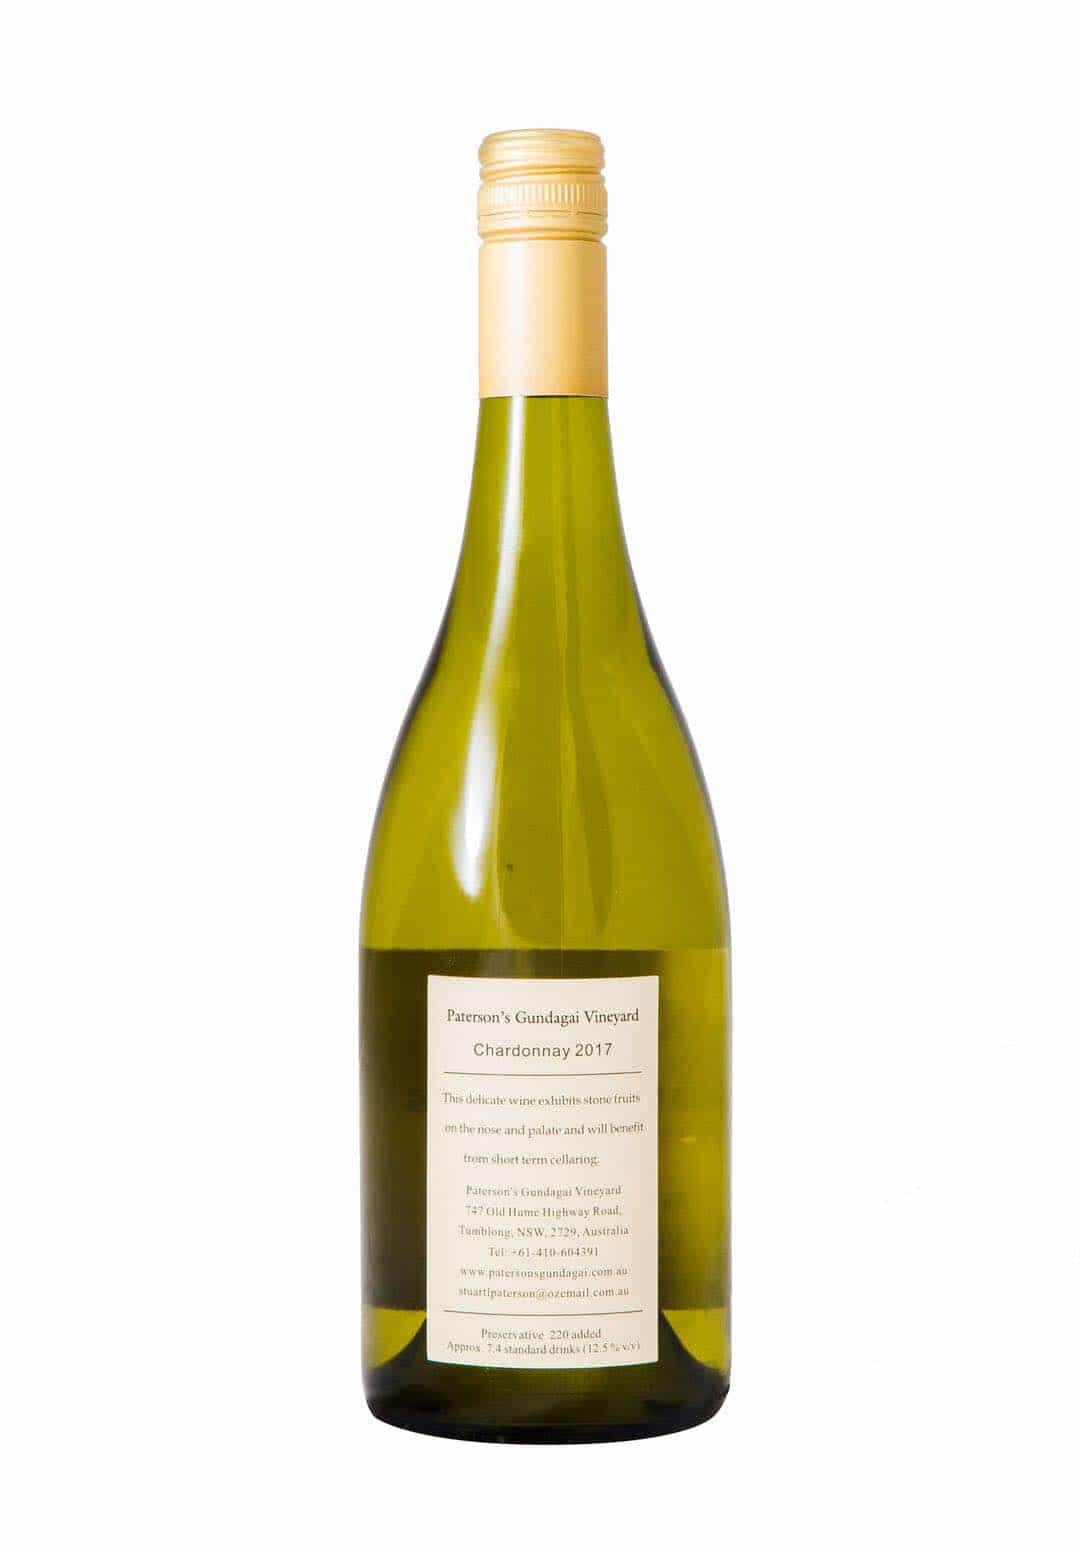 2017 Paterson's Gundagai Vineyard Chardonnay